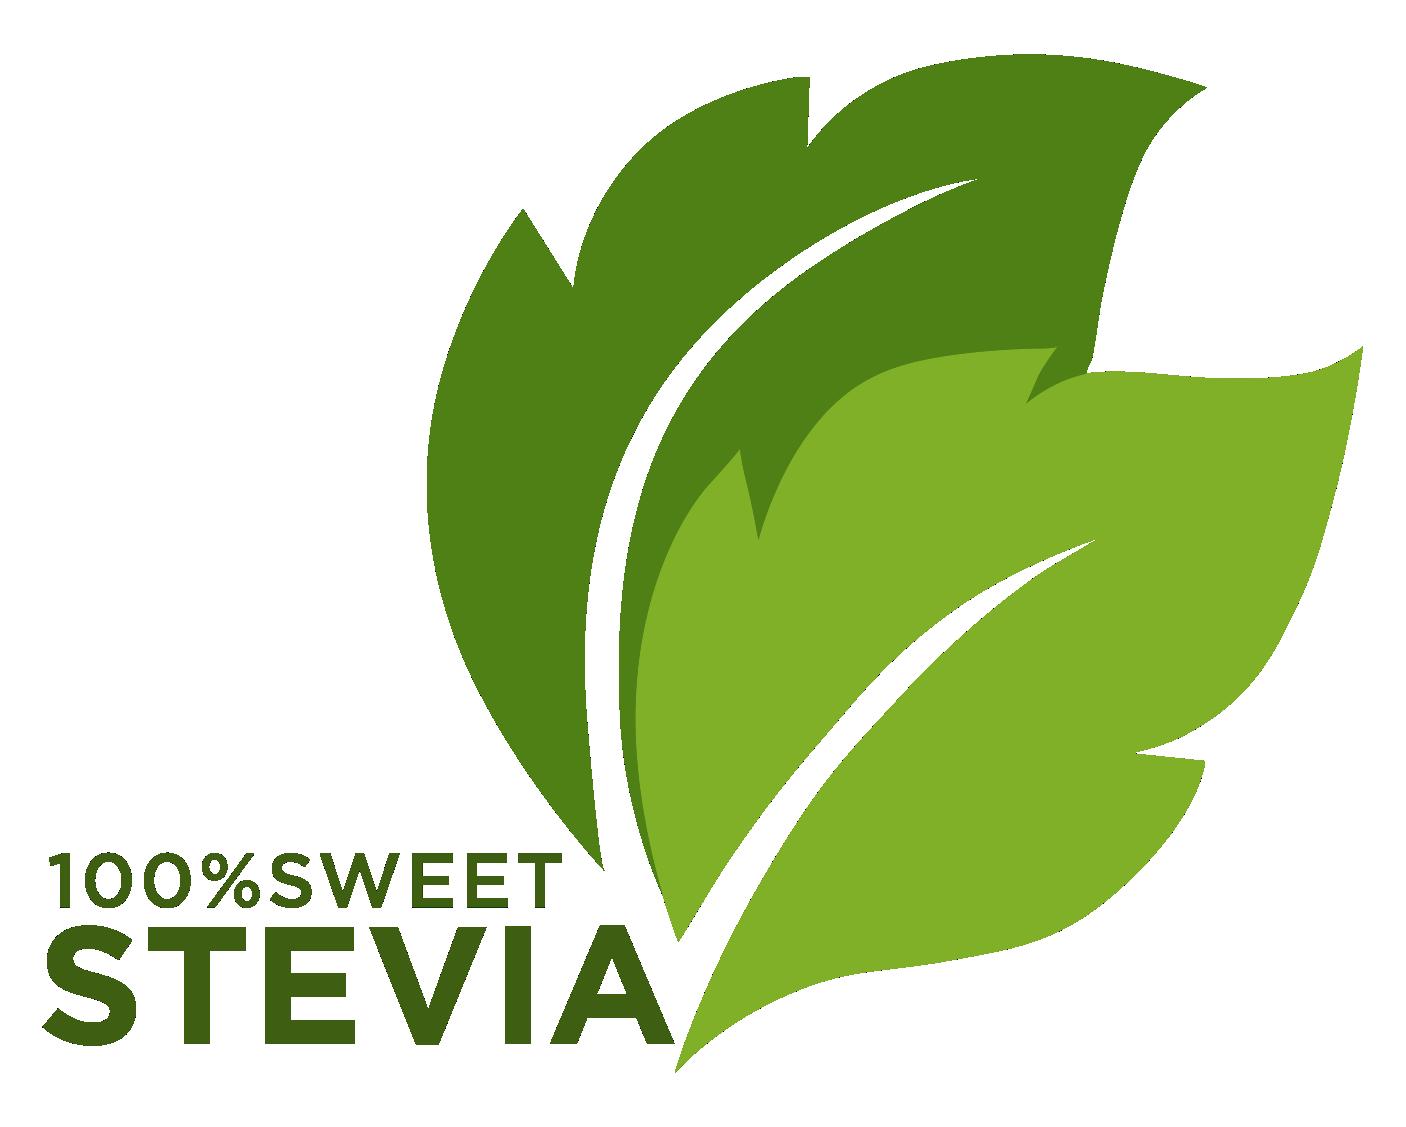 Stevia_logo transparent.png